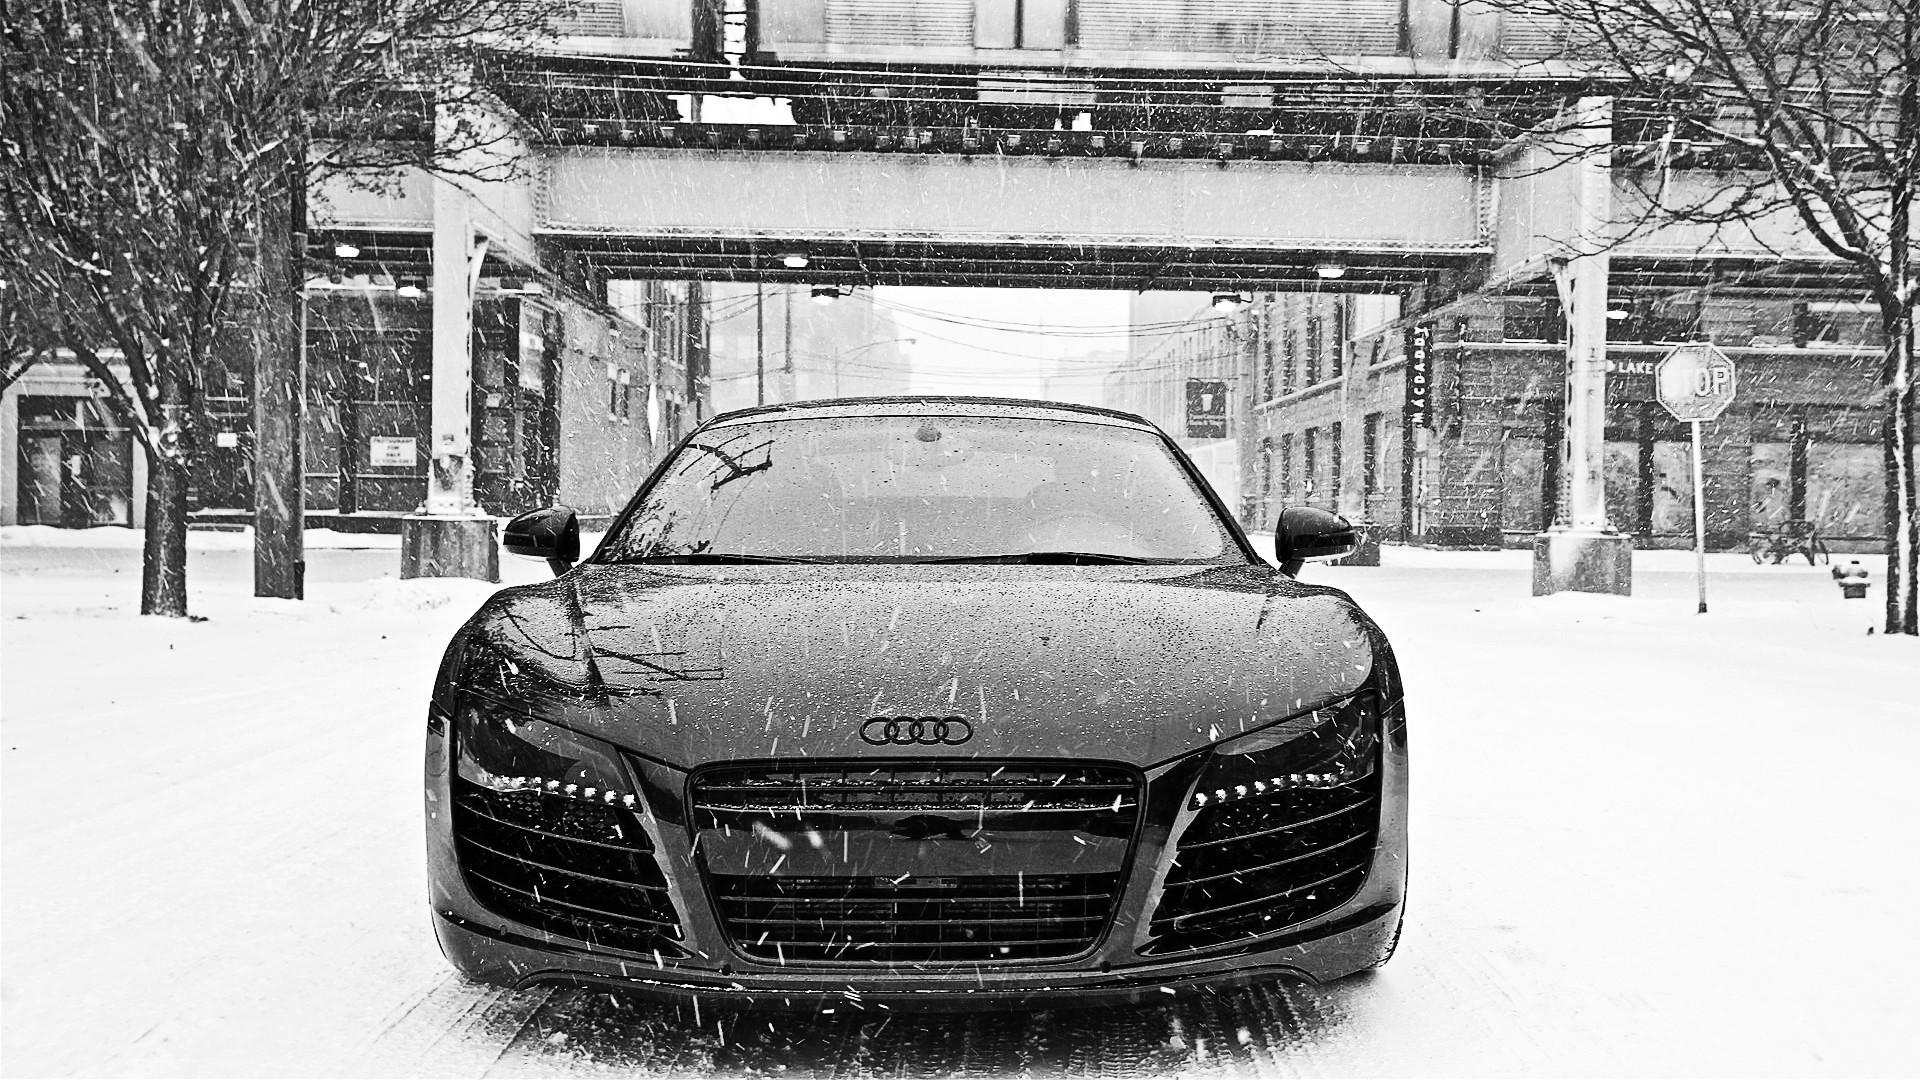 Hd Audi R8 in snow Desktop Wallpaper